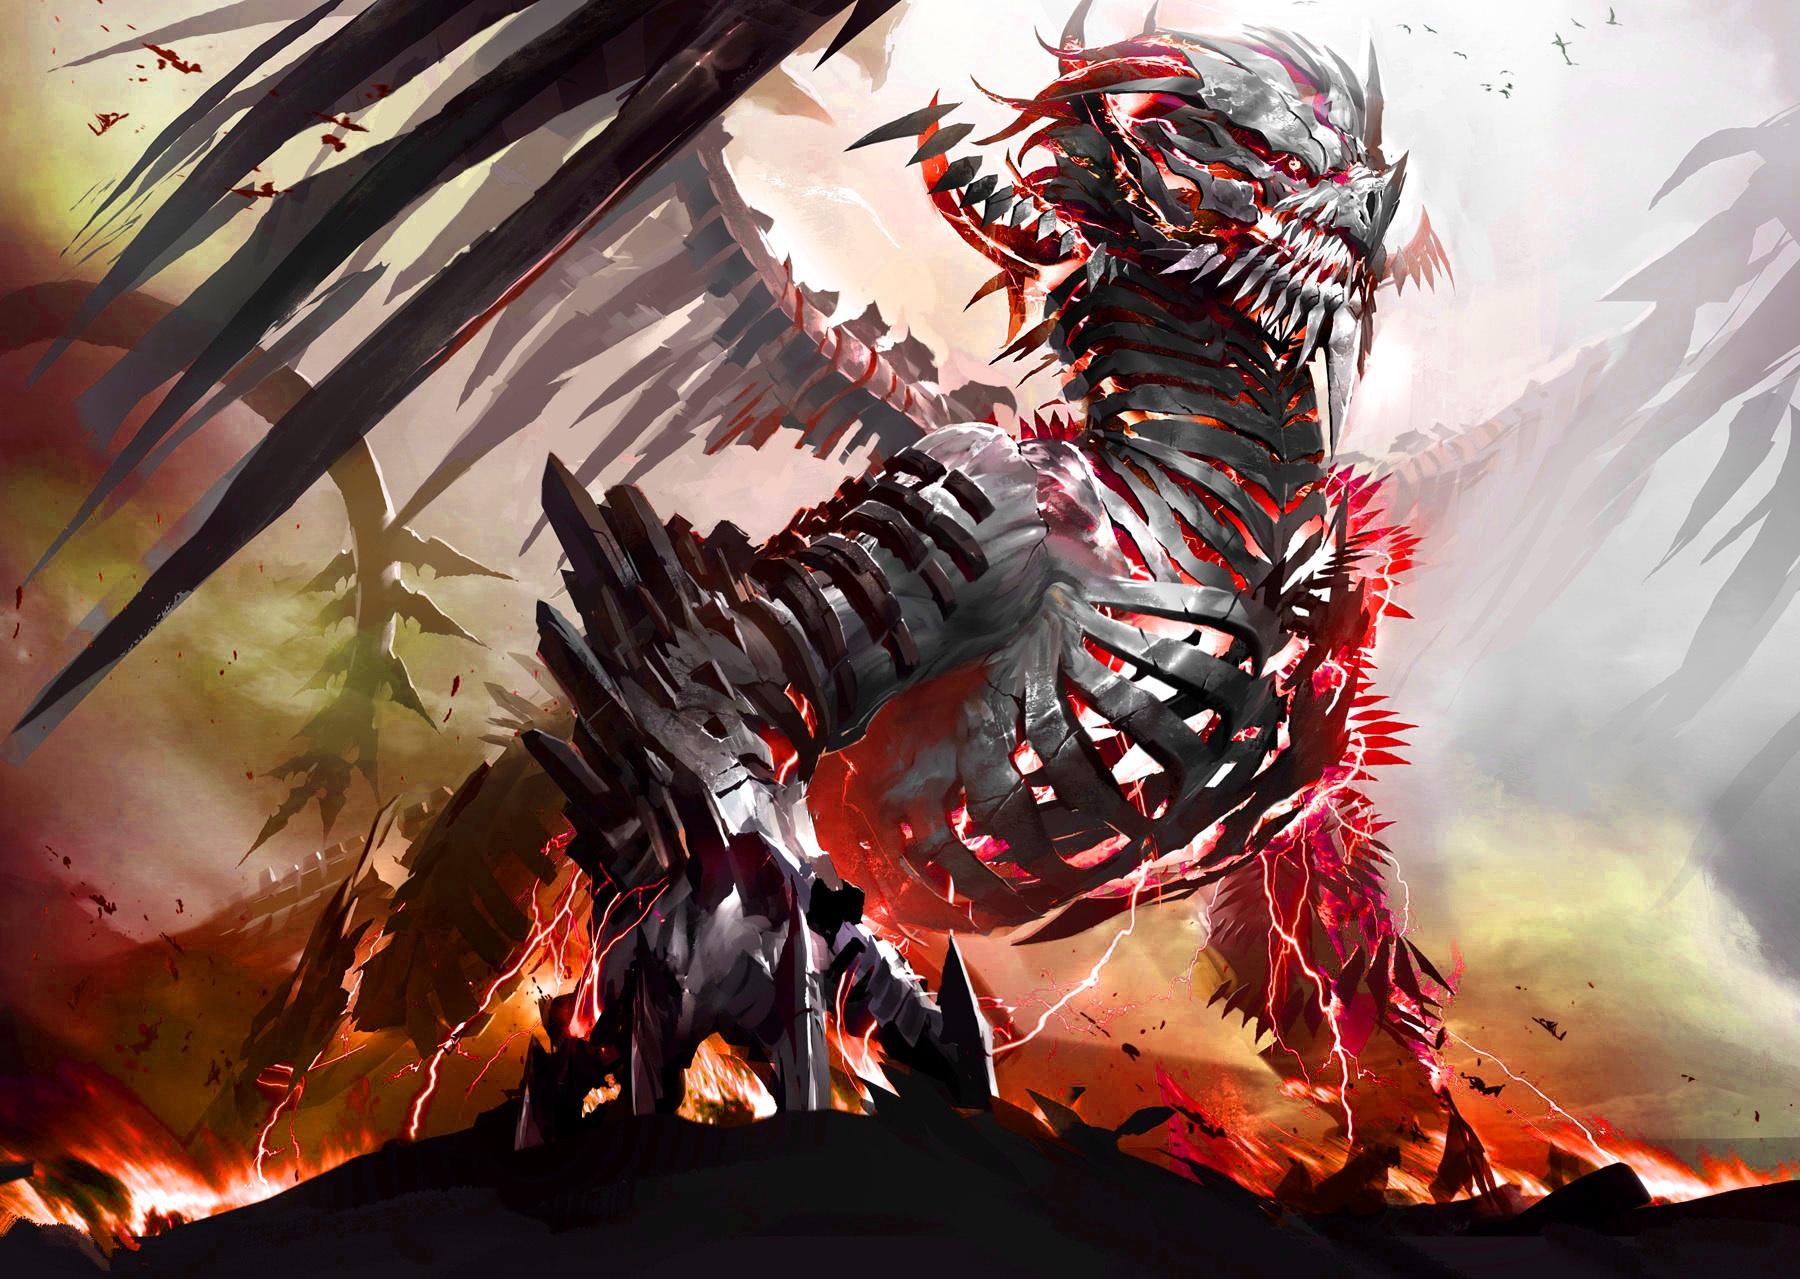 Dragon Art Wallpapers - http://hdwallpapersf.com/dragon-art ...